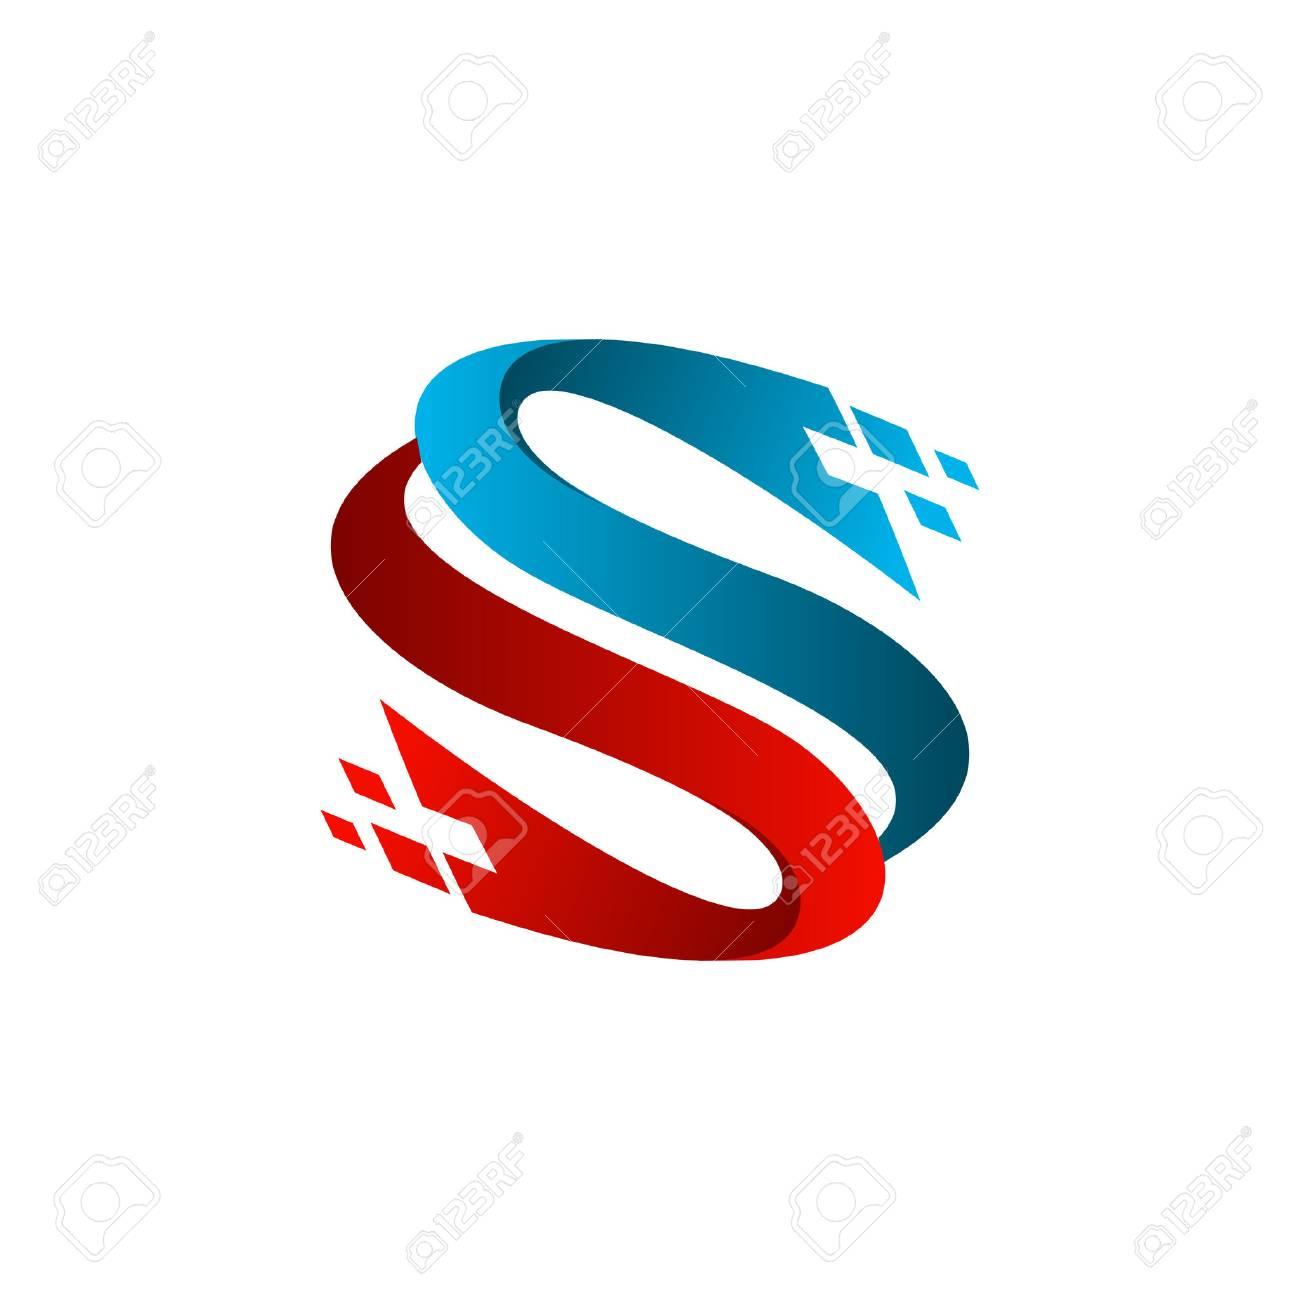 letter s technology logo design concept template - 83305418